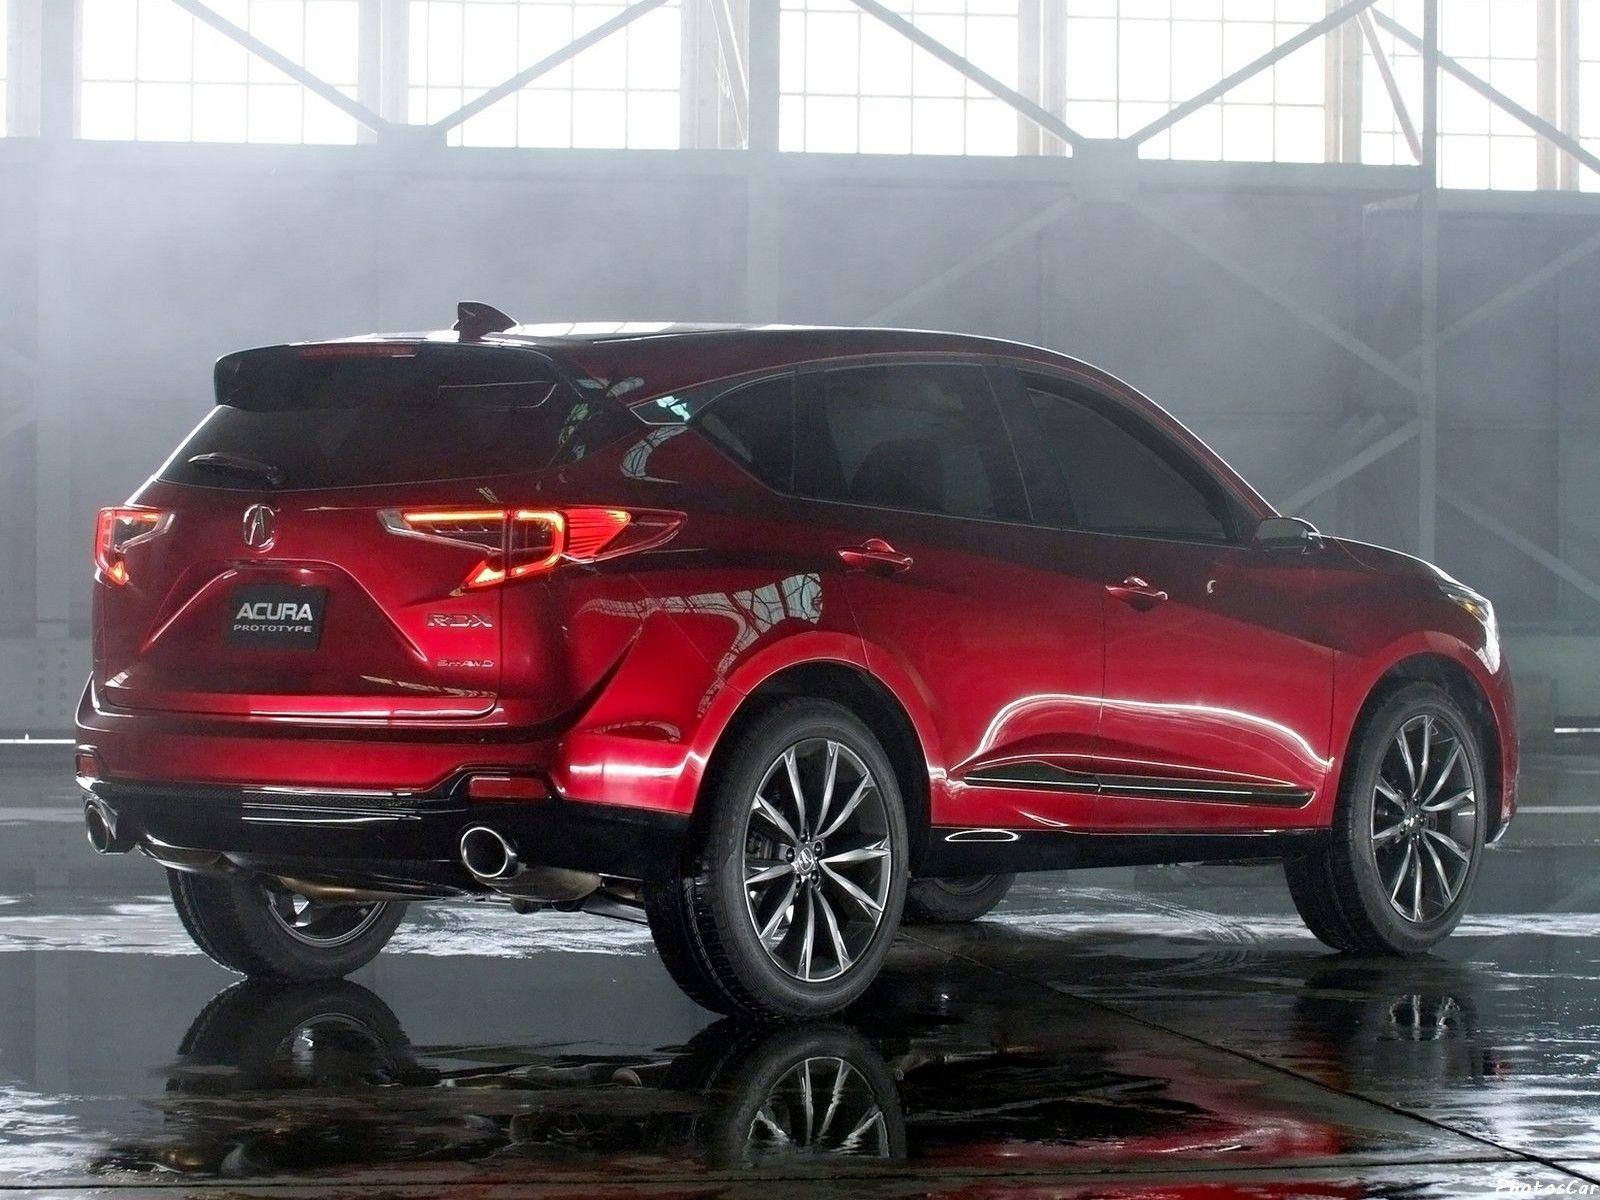 Acura Rdx Prototype Nouveau Design Inspire Et Evocateur Honda Suv